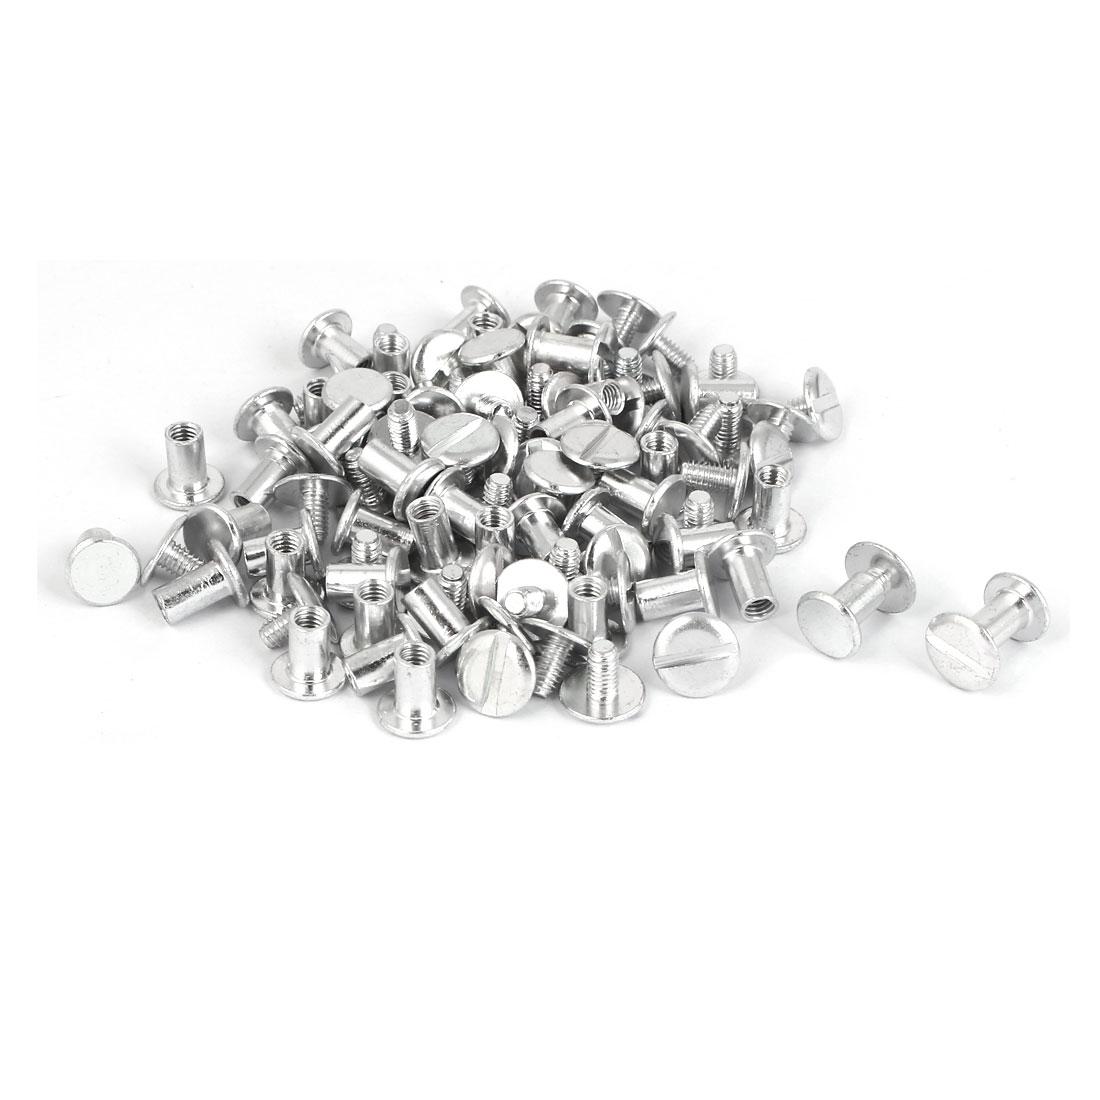 Purse Belts Scrapbooks Aluminum Binding Chicago Screws Posts M5 x 8mm 50 Pcs